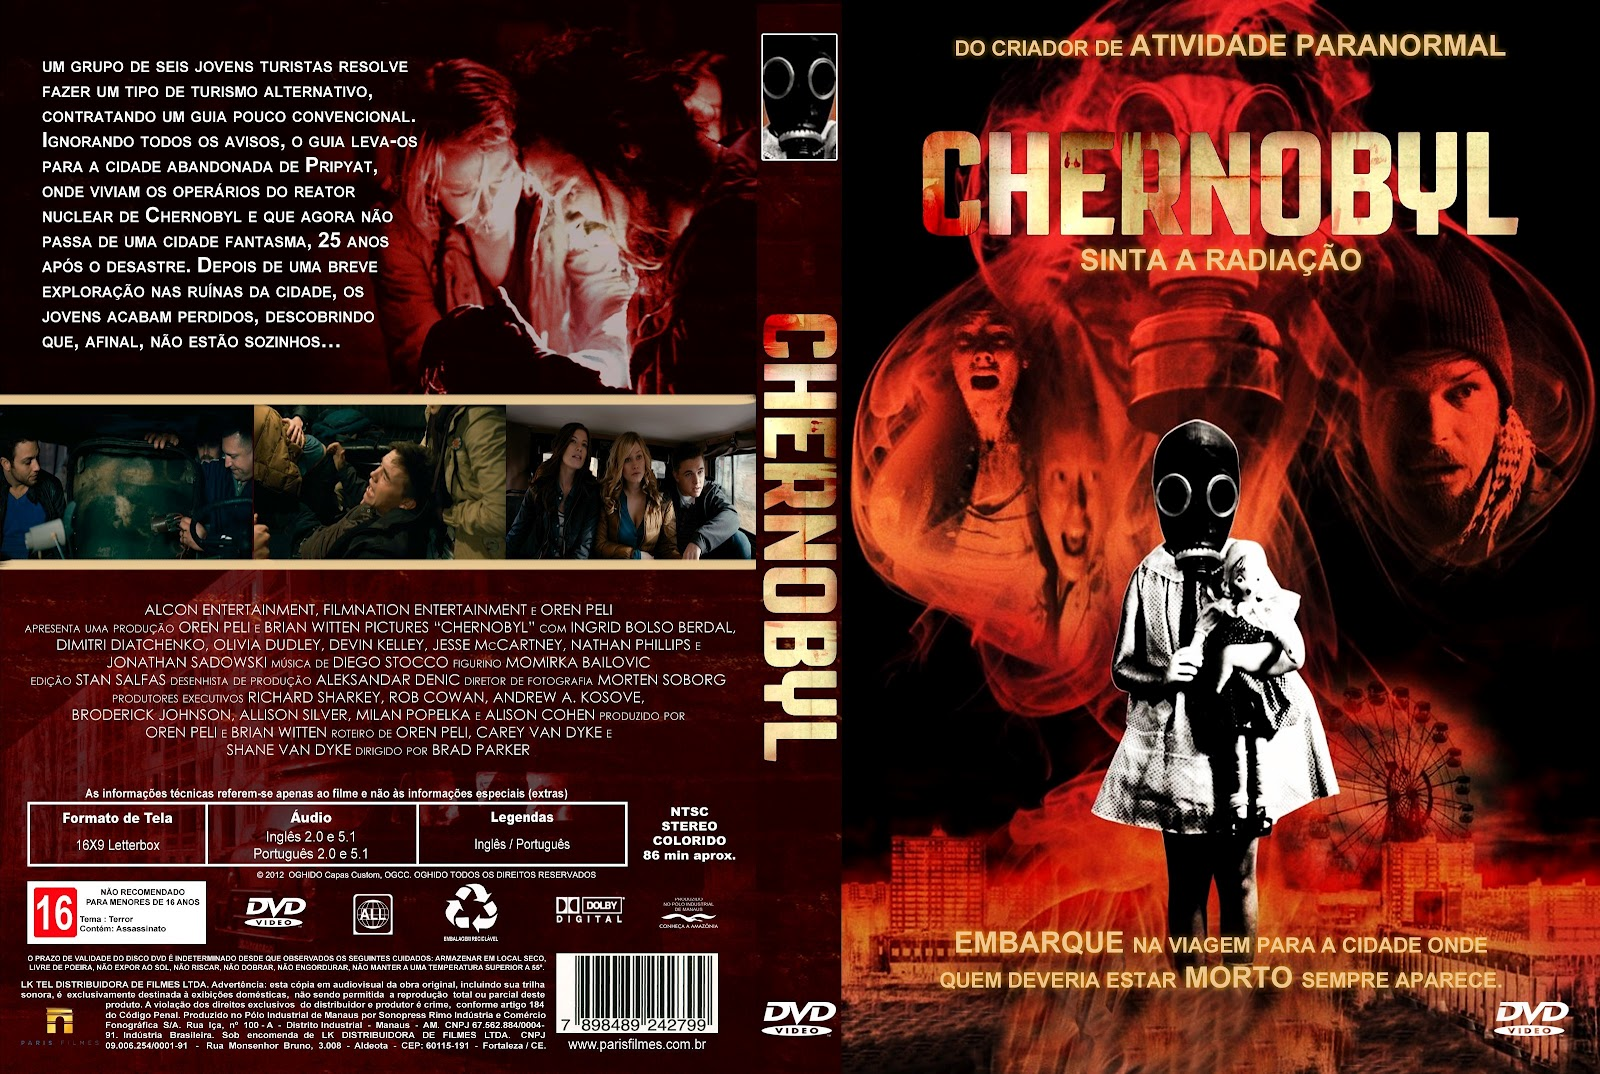 Dimitri Diatchenko, Jesse McCartney, Nathan Phillips, Jonathan Sadowski, Ingrid Bolsø Berdal, Olivia Taylor Dudley, and Devin Kelley in Chernobyl Diaries (2012)